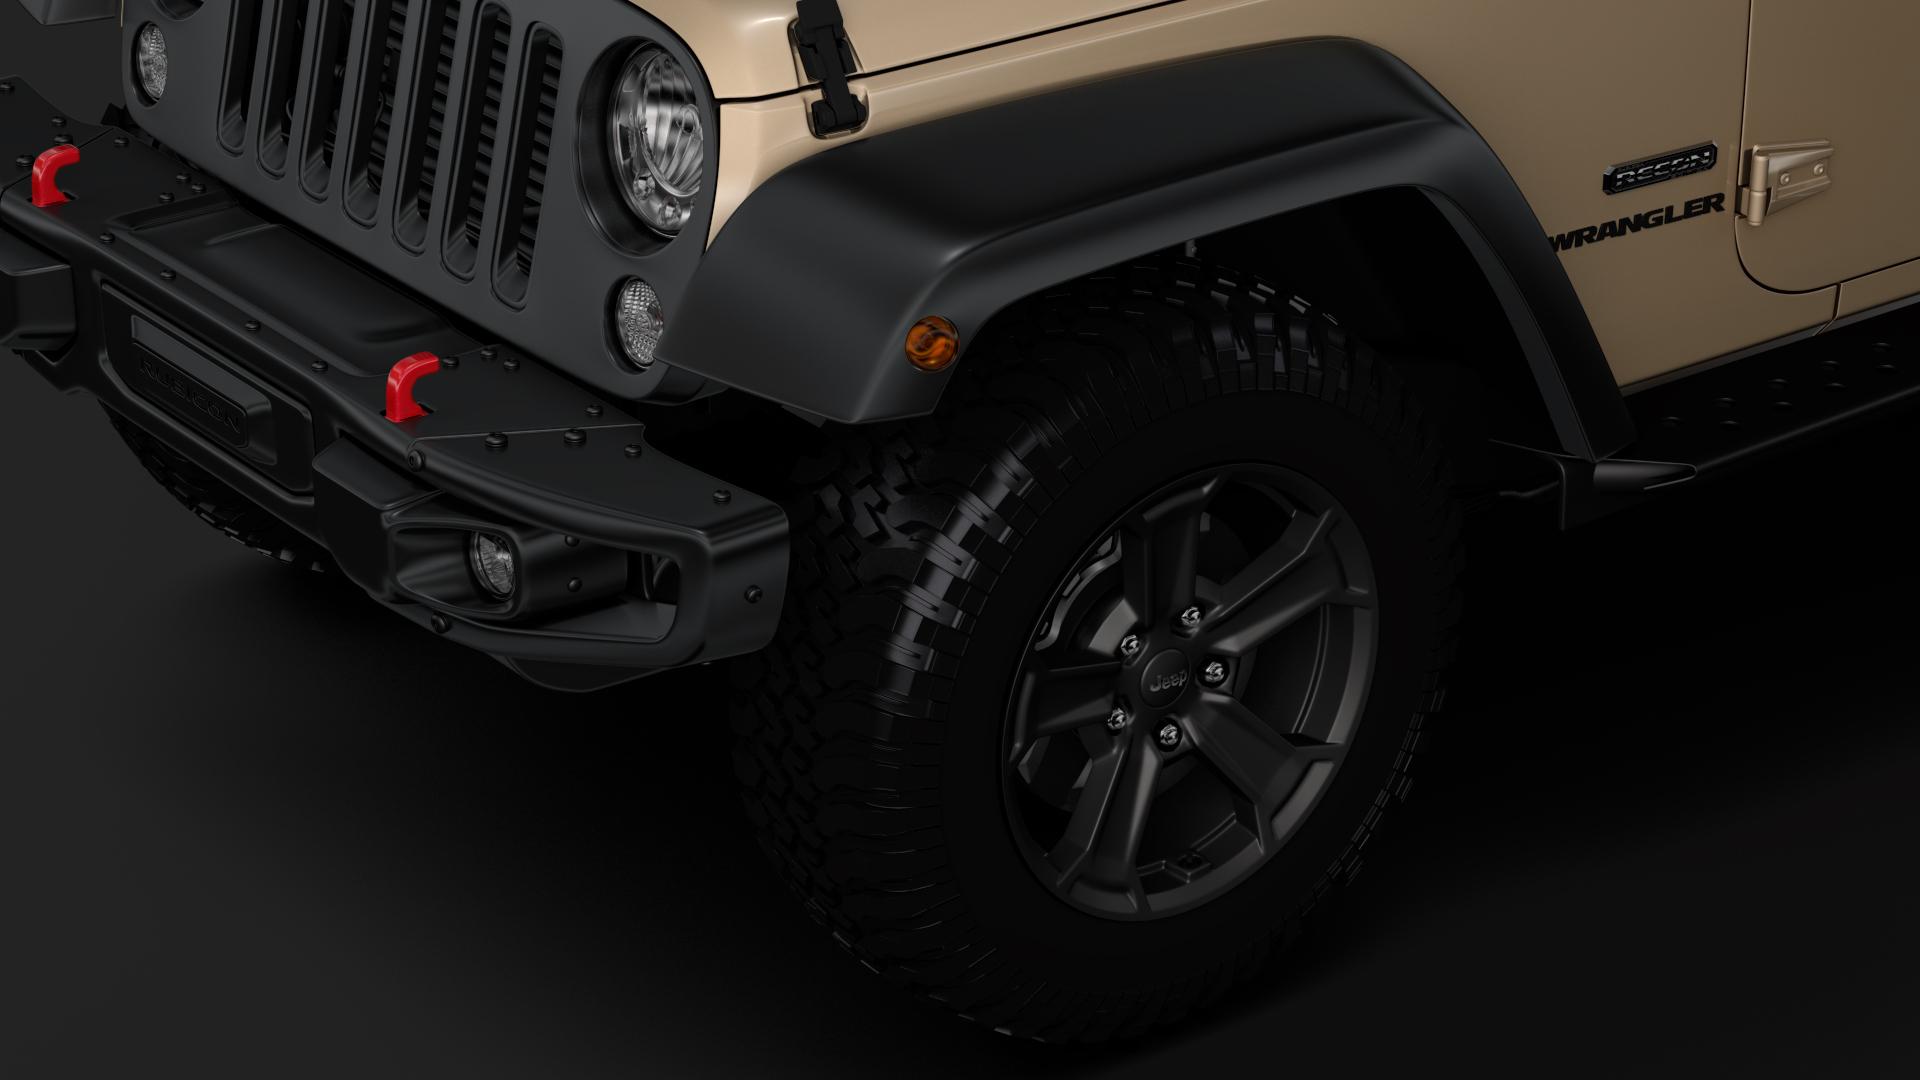 jeep wrangler rubicon recon jk 2017 3d model max fbx lwo ma mb hrc xsi obj 276944